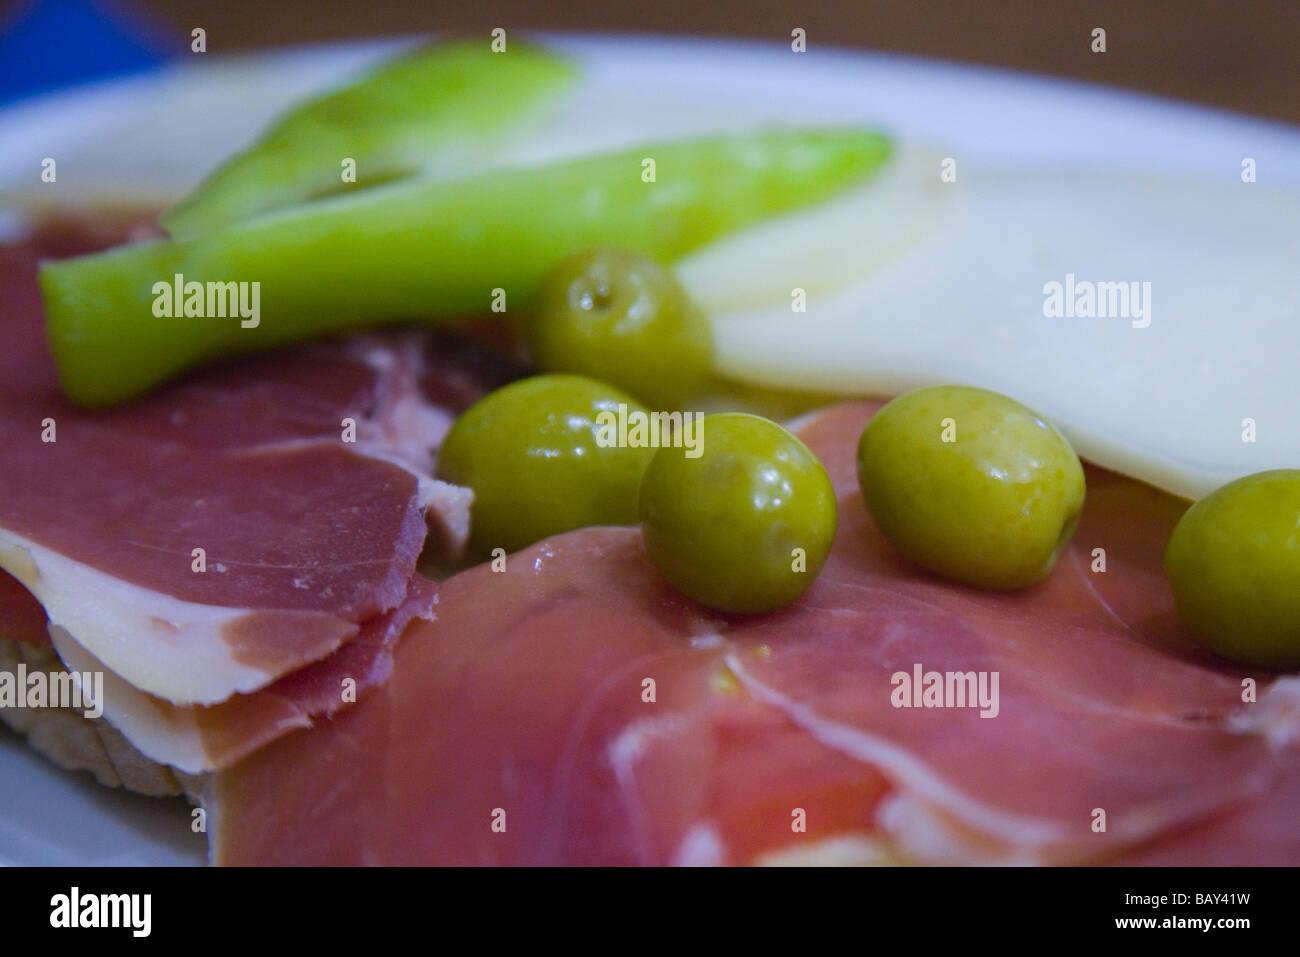 Pa amb Oli ham sandwich at Sa Placa Can Jordi Bar, Puigpunyent, Mallorca, Balearic Islands, Spain - Stock Image